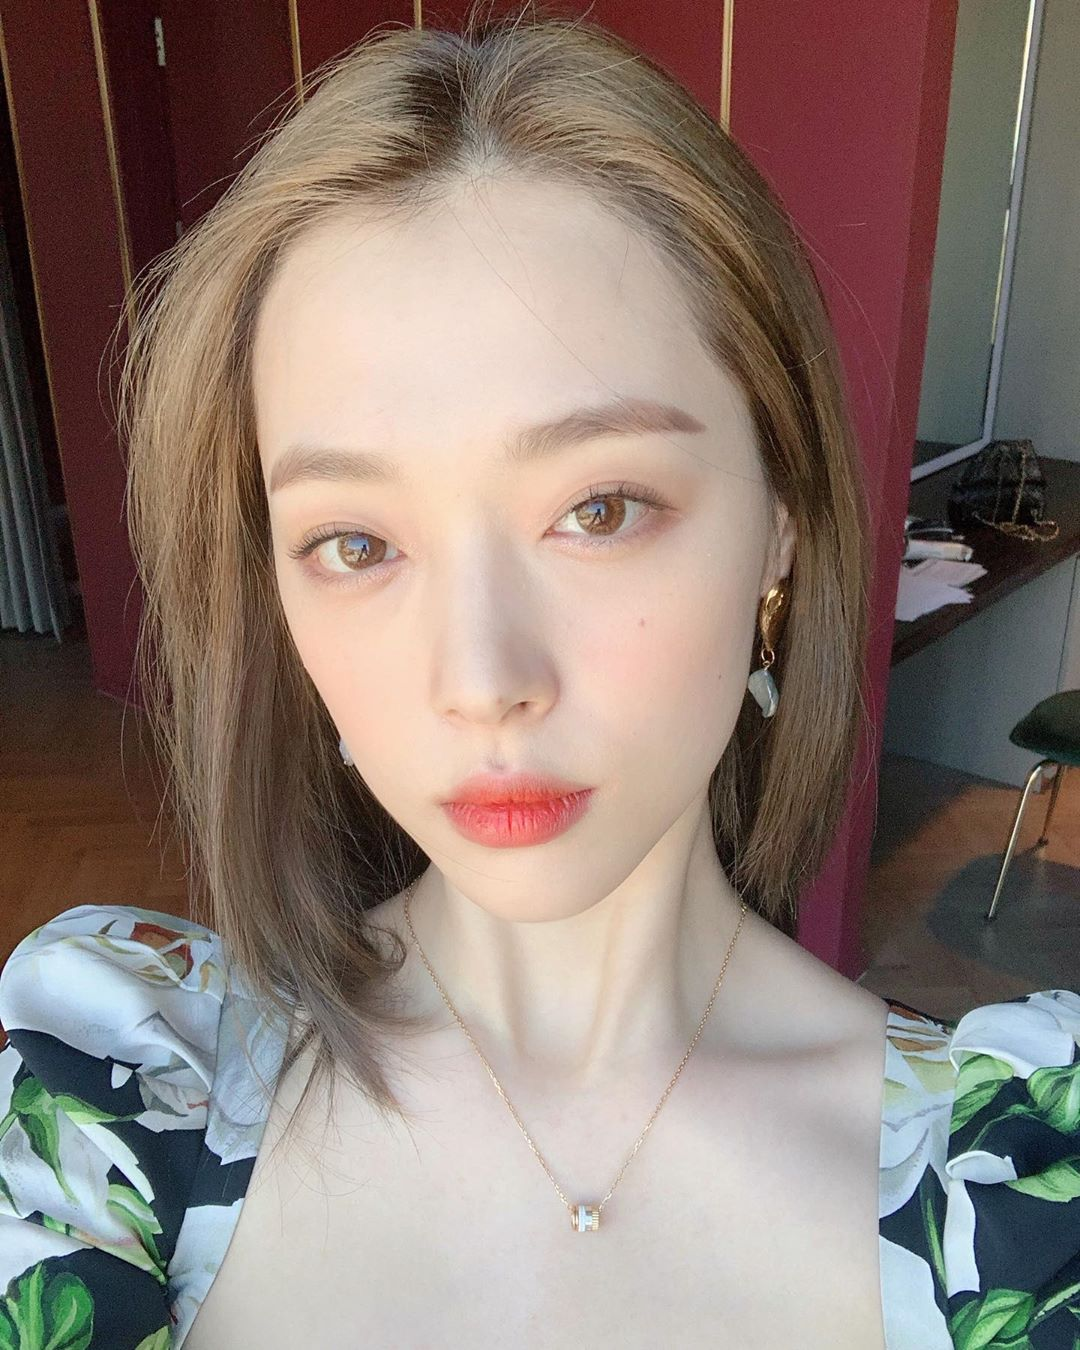 Sulli South Korea Actress, Singer, Model